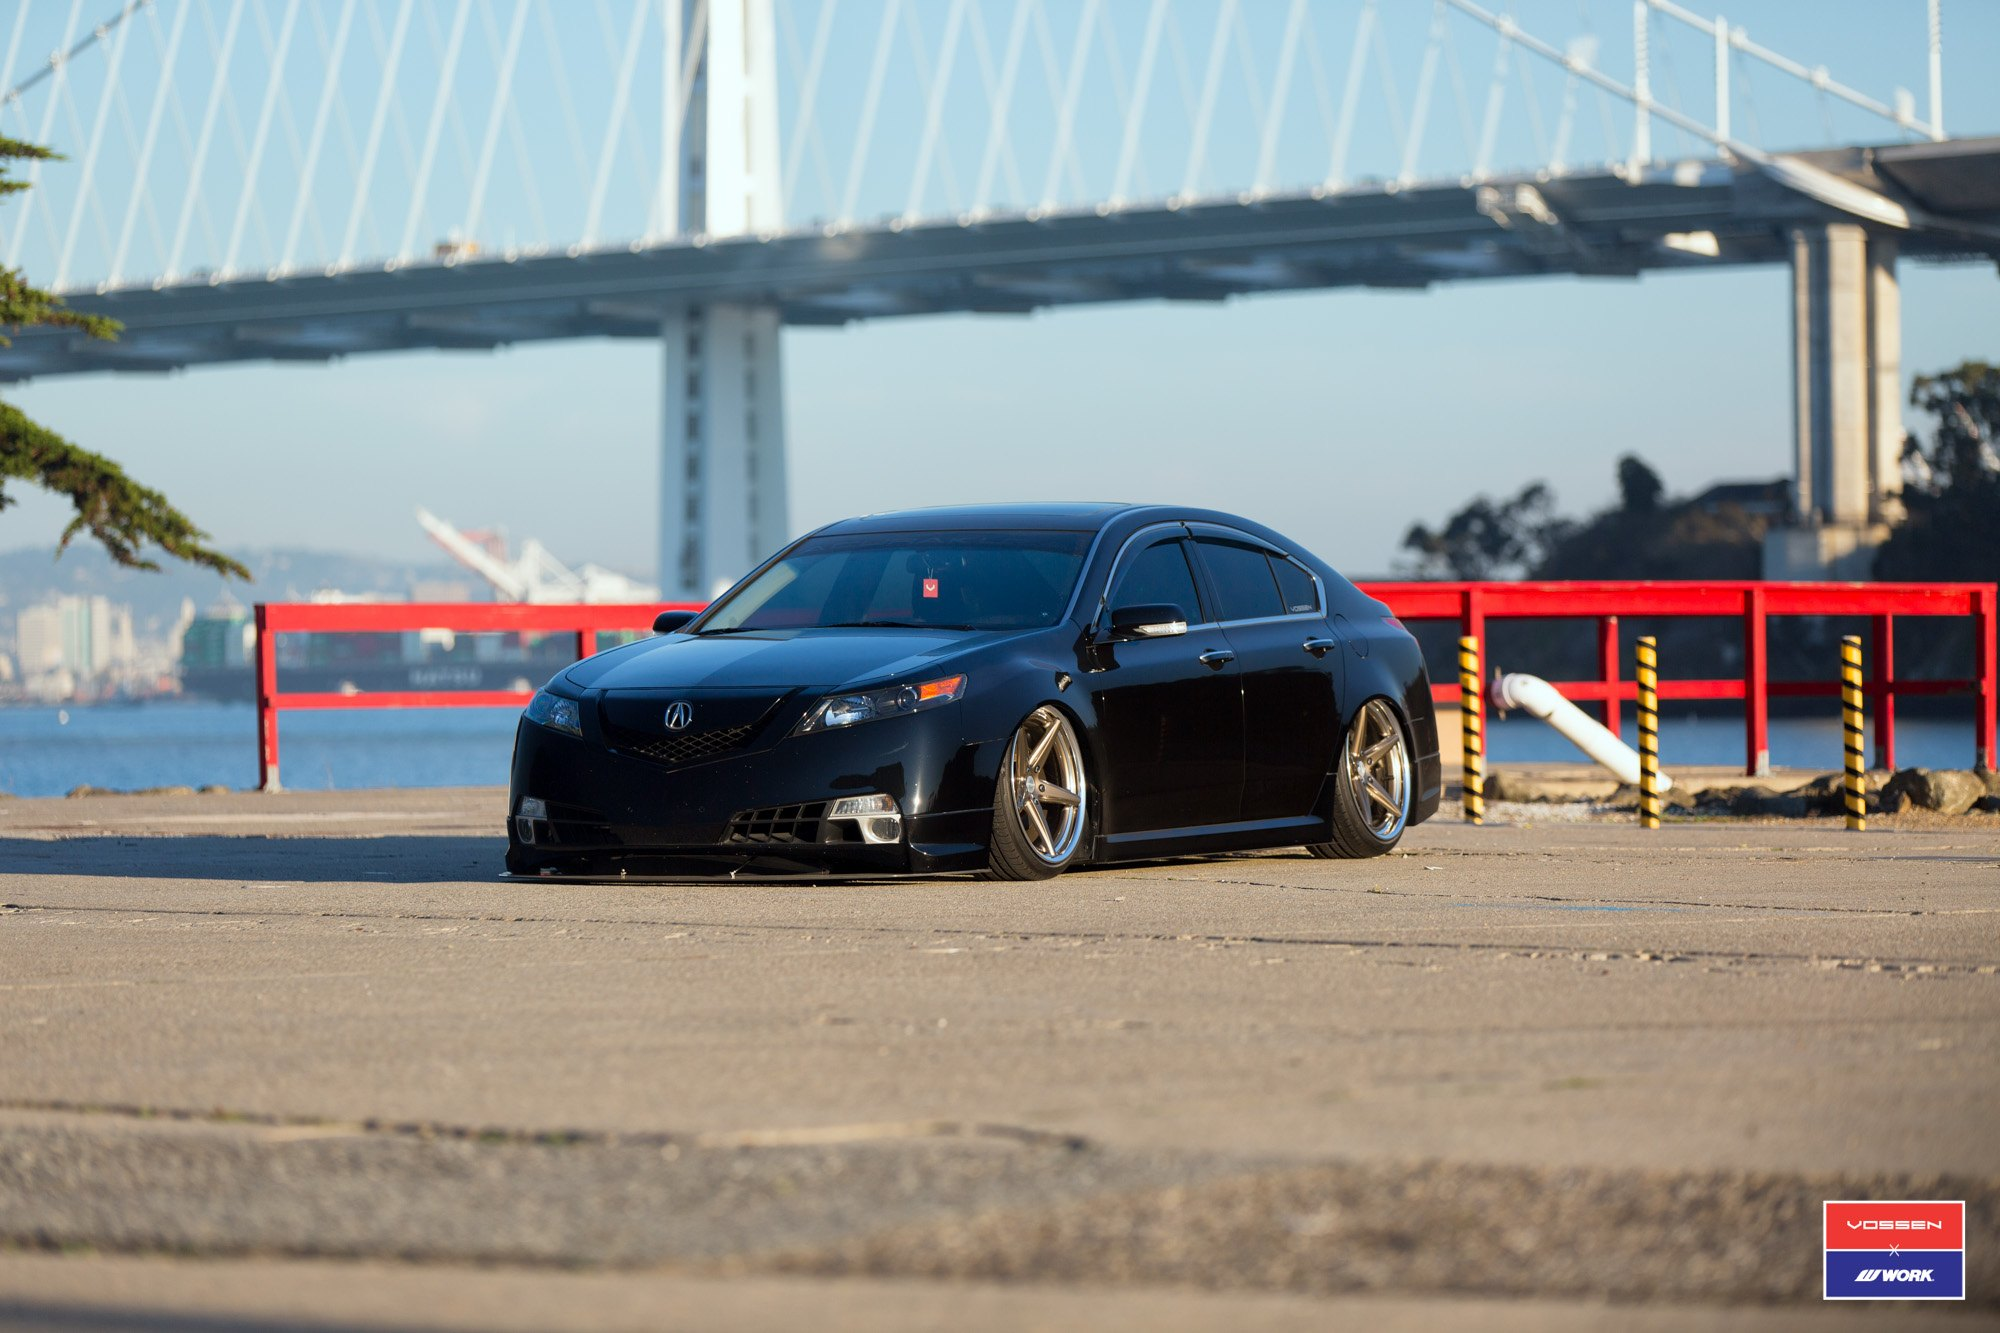 Custom Acura TL Images Mods Photos Upgrades CARiDcom Gallery - Acura tl gold rims